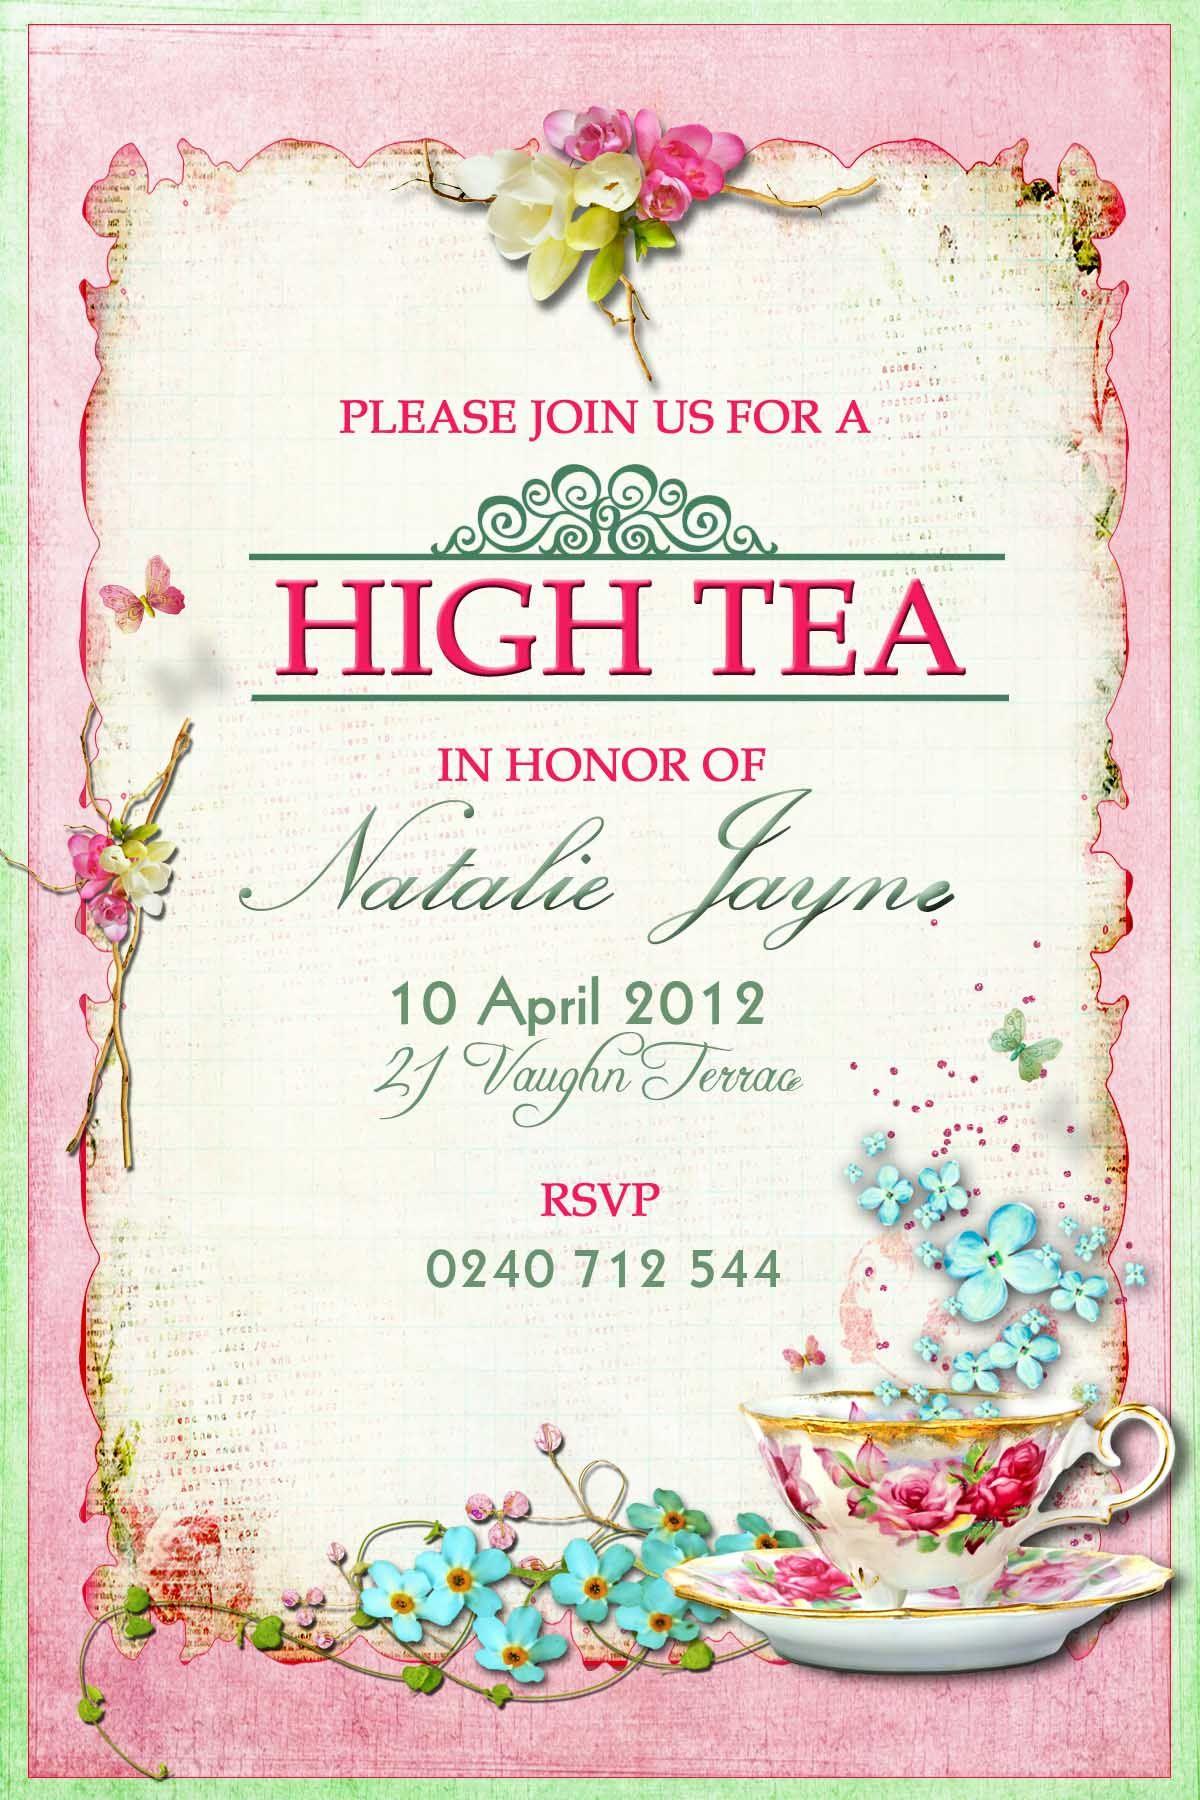 High Tea Invitation Idea   Vegan Tea Time Ⓥ In 2019   High Tea - Free Printable Kitchen Tea Invitation Templates